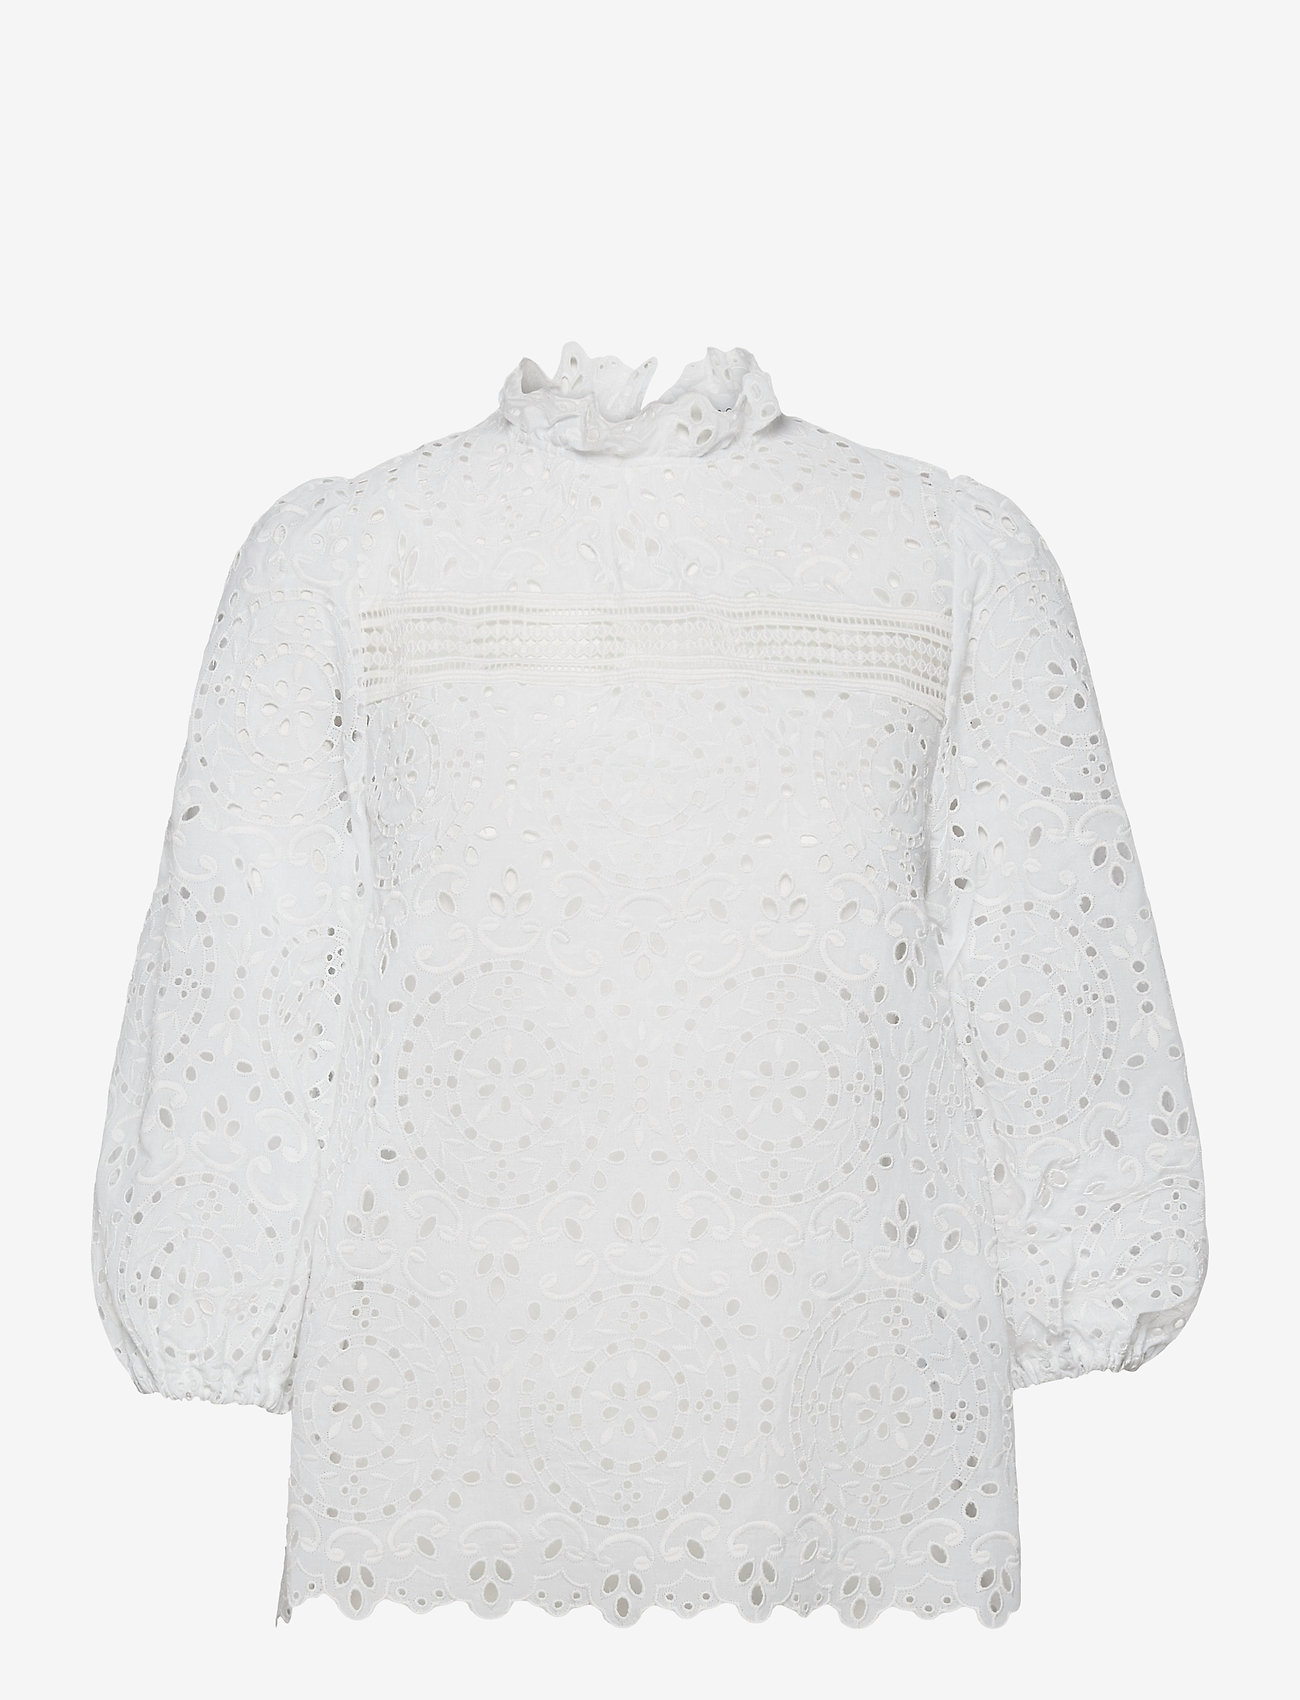 Ivy & Oak - AJUGA - long sleeved blouses - snow white - 0